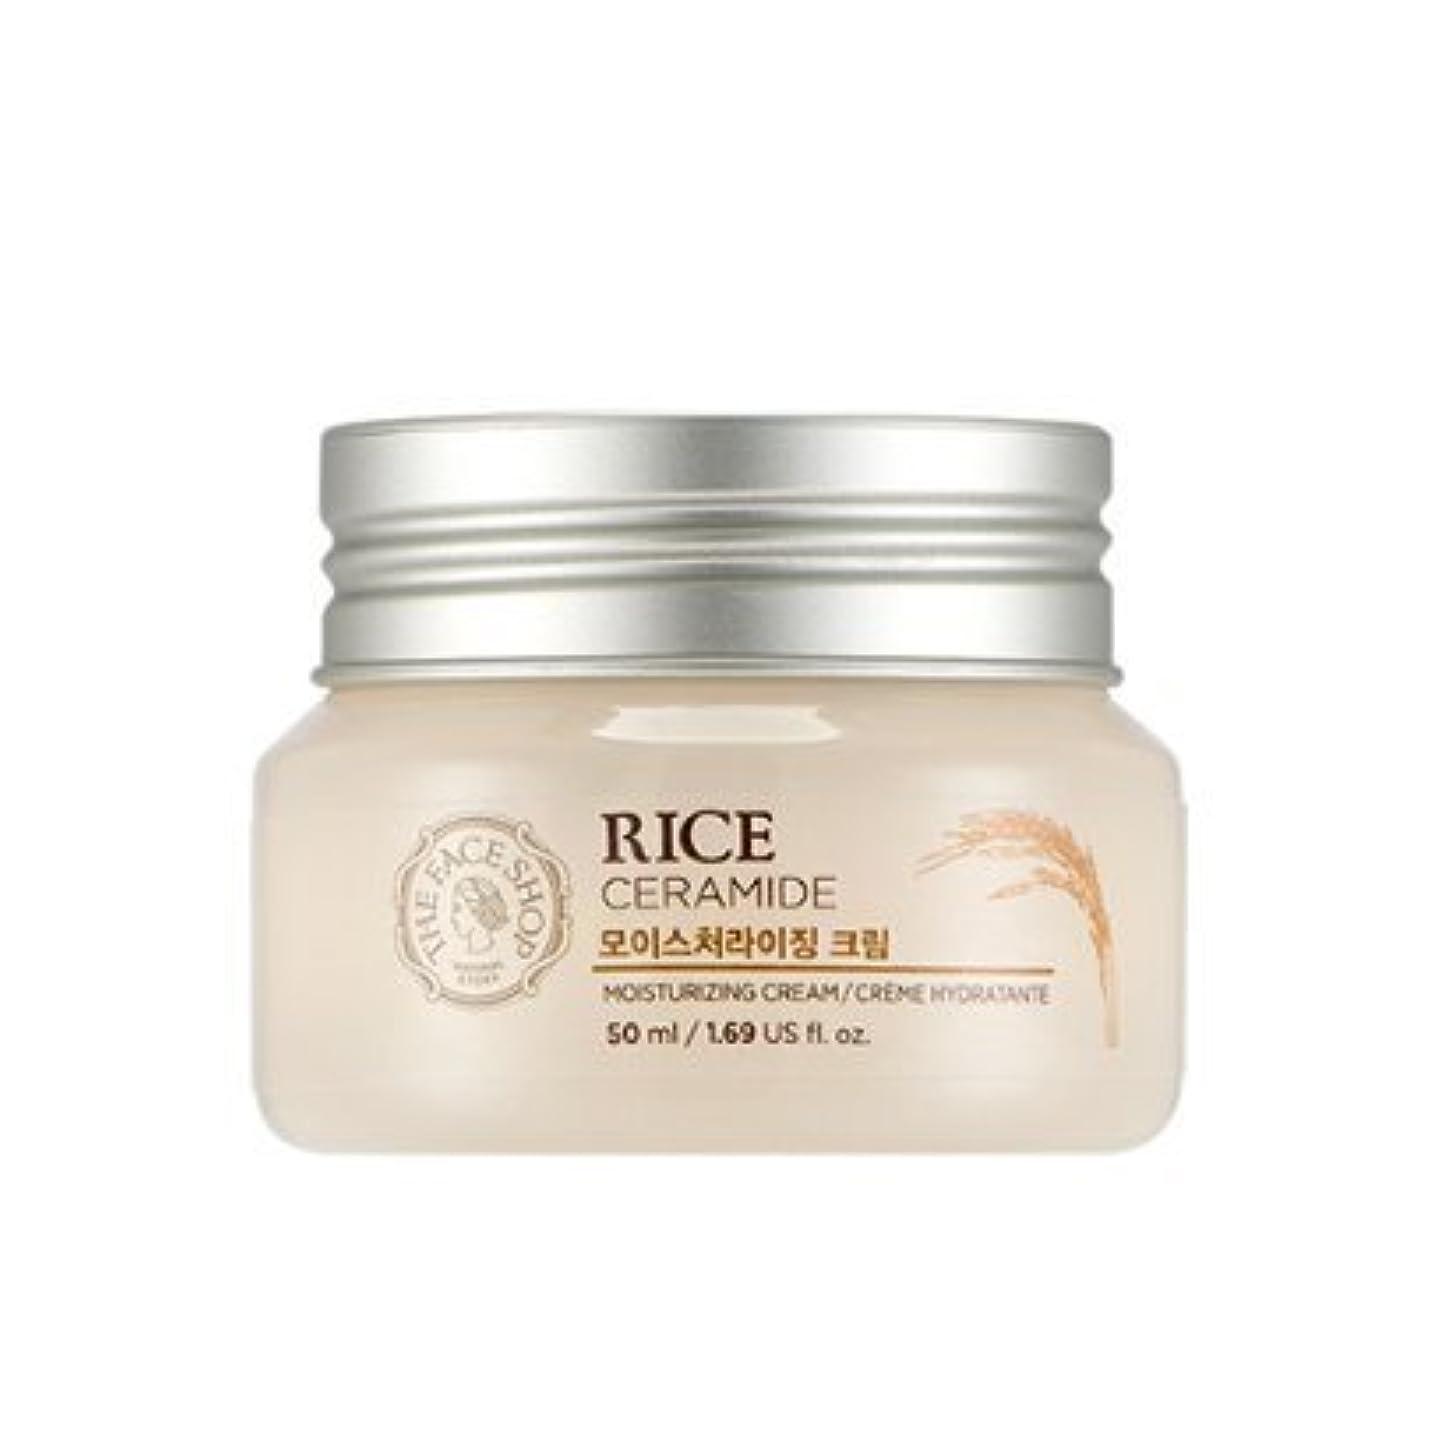 THE FACE SHOP Rice & Ceramide Moisturizing Cream ザフェイスショップ ライス&セラミドモイスチャーライジングクリーム [並行輸入品]